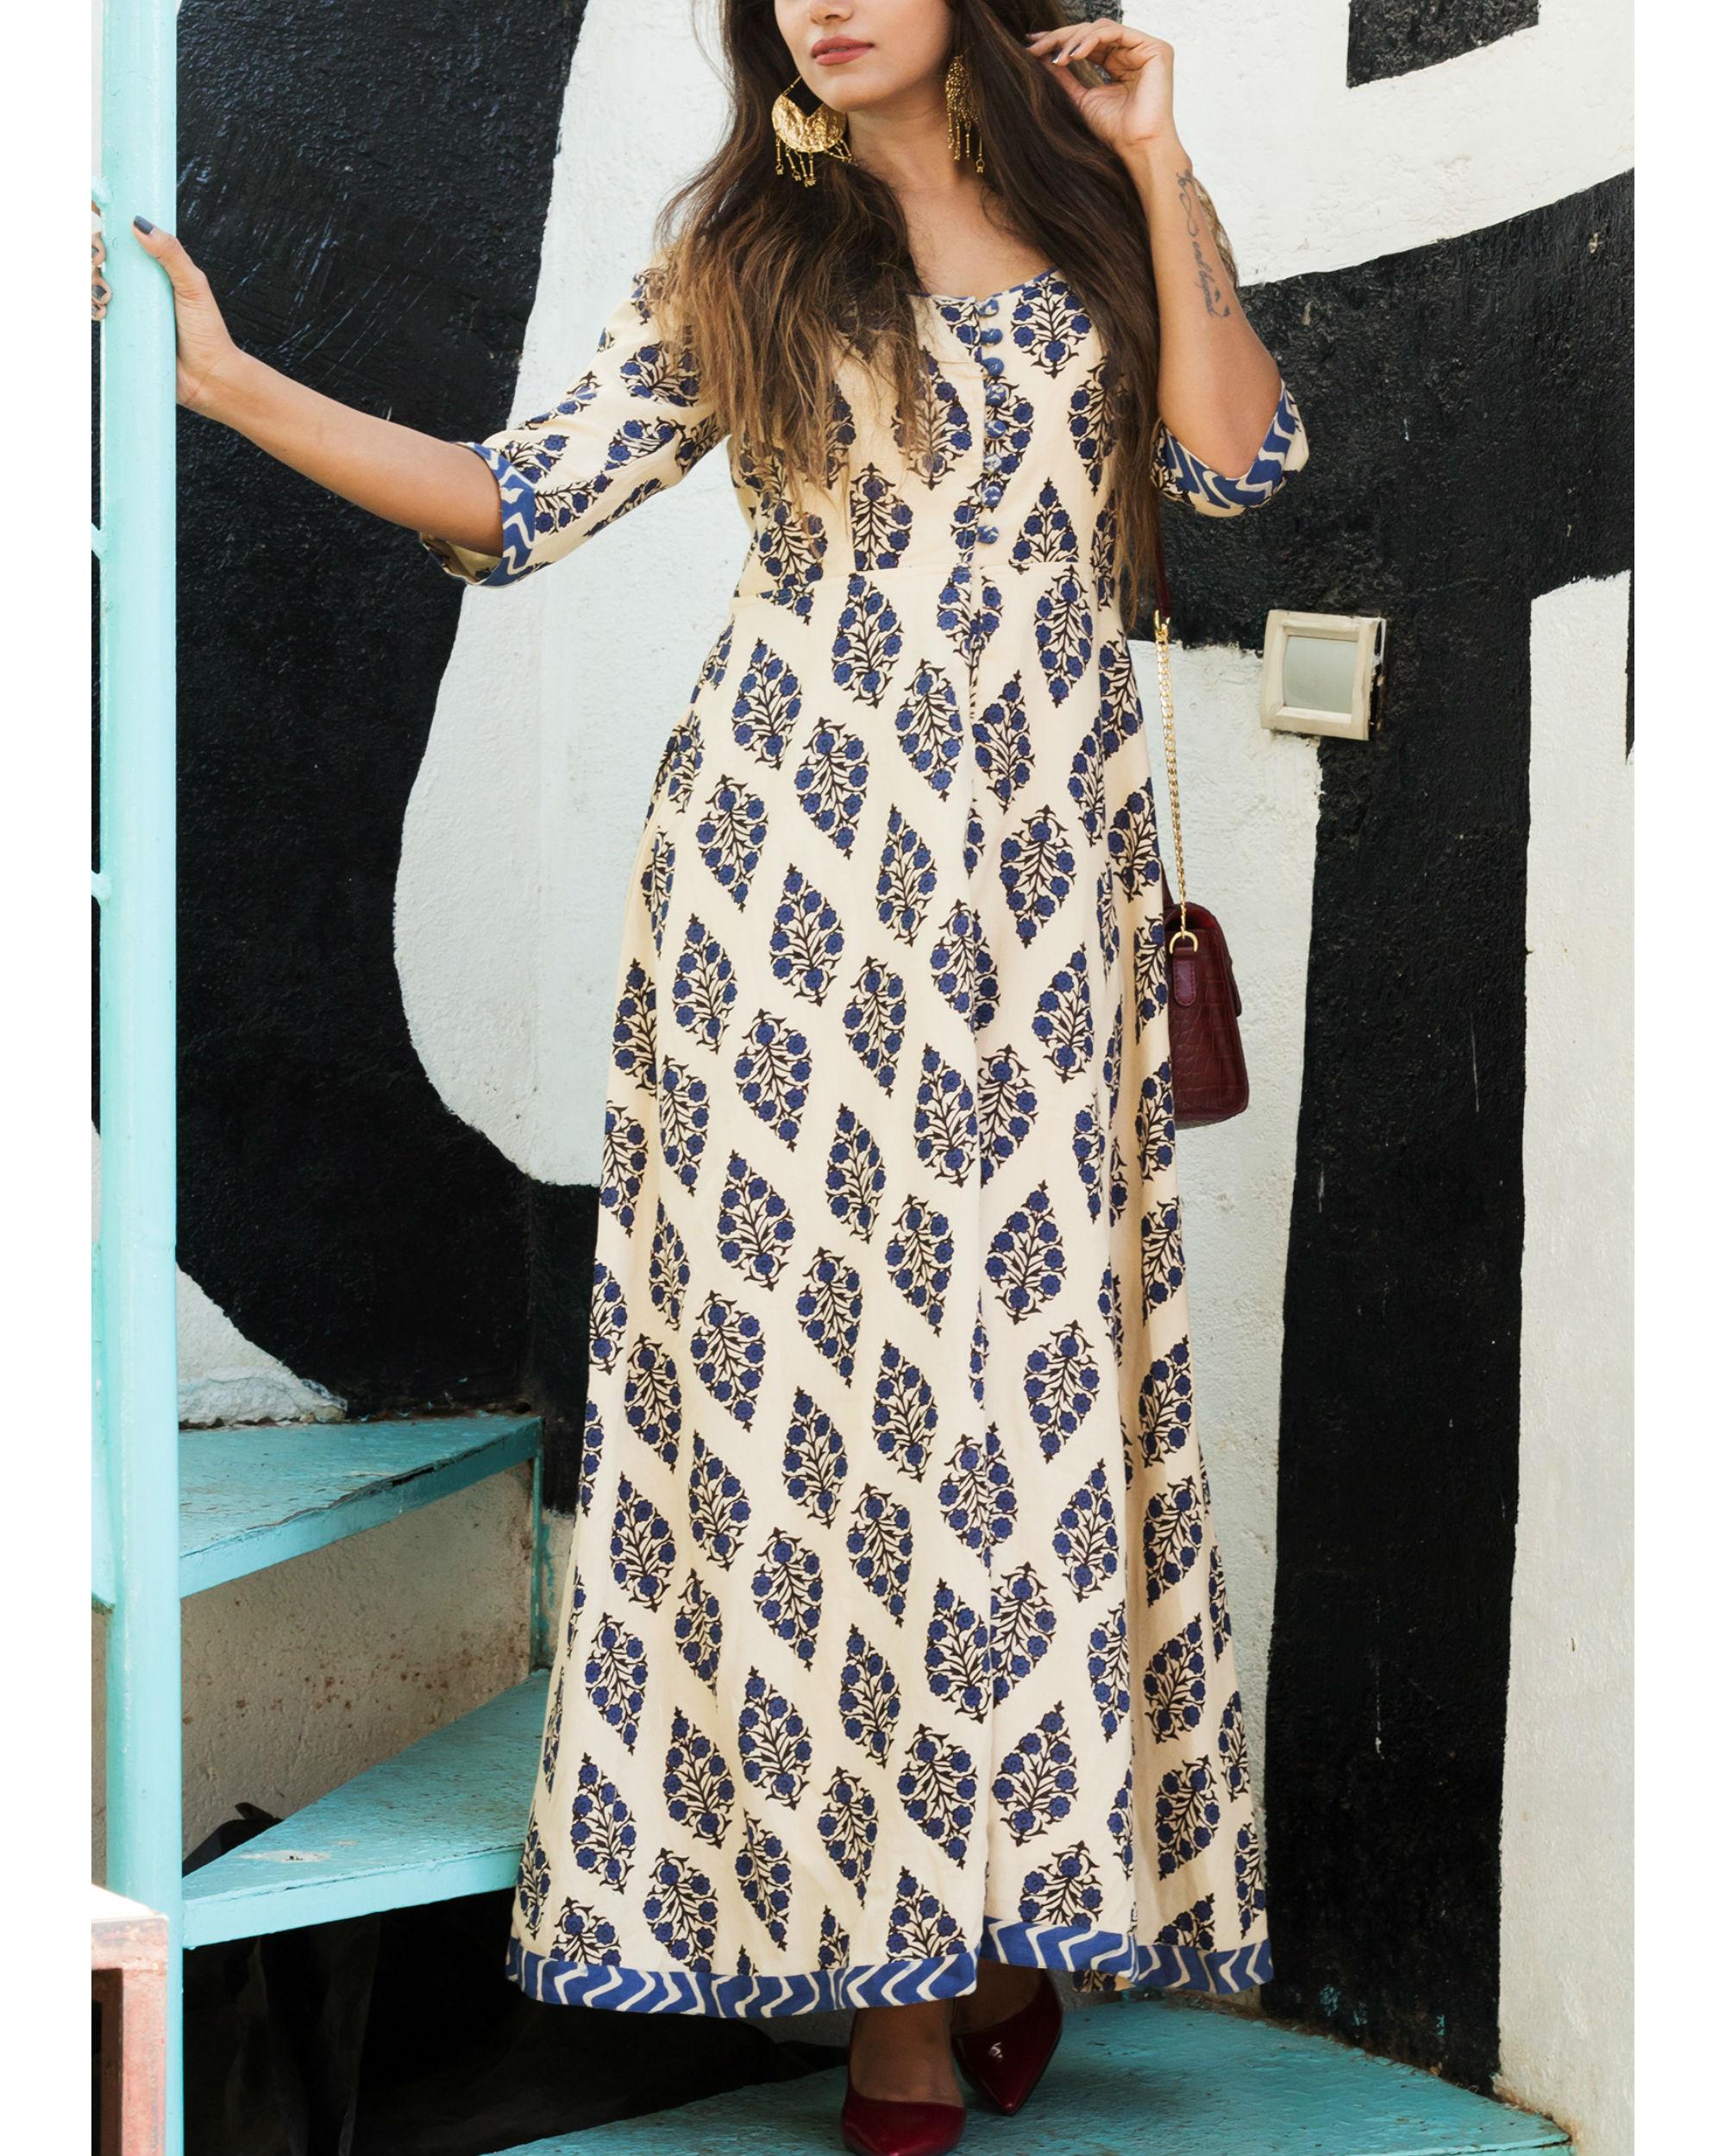 Floral geometric border dress